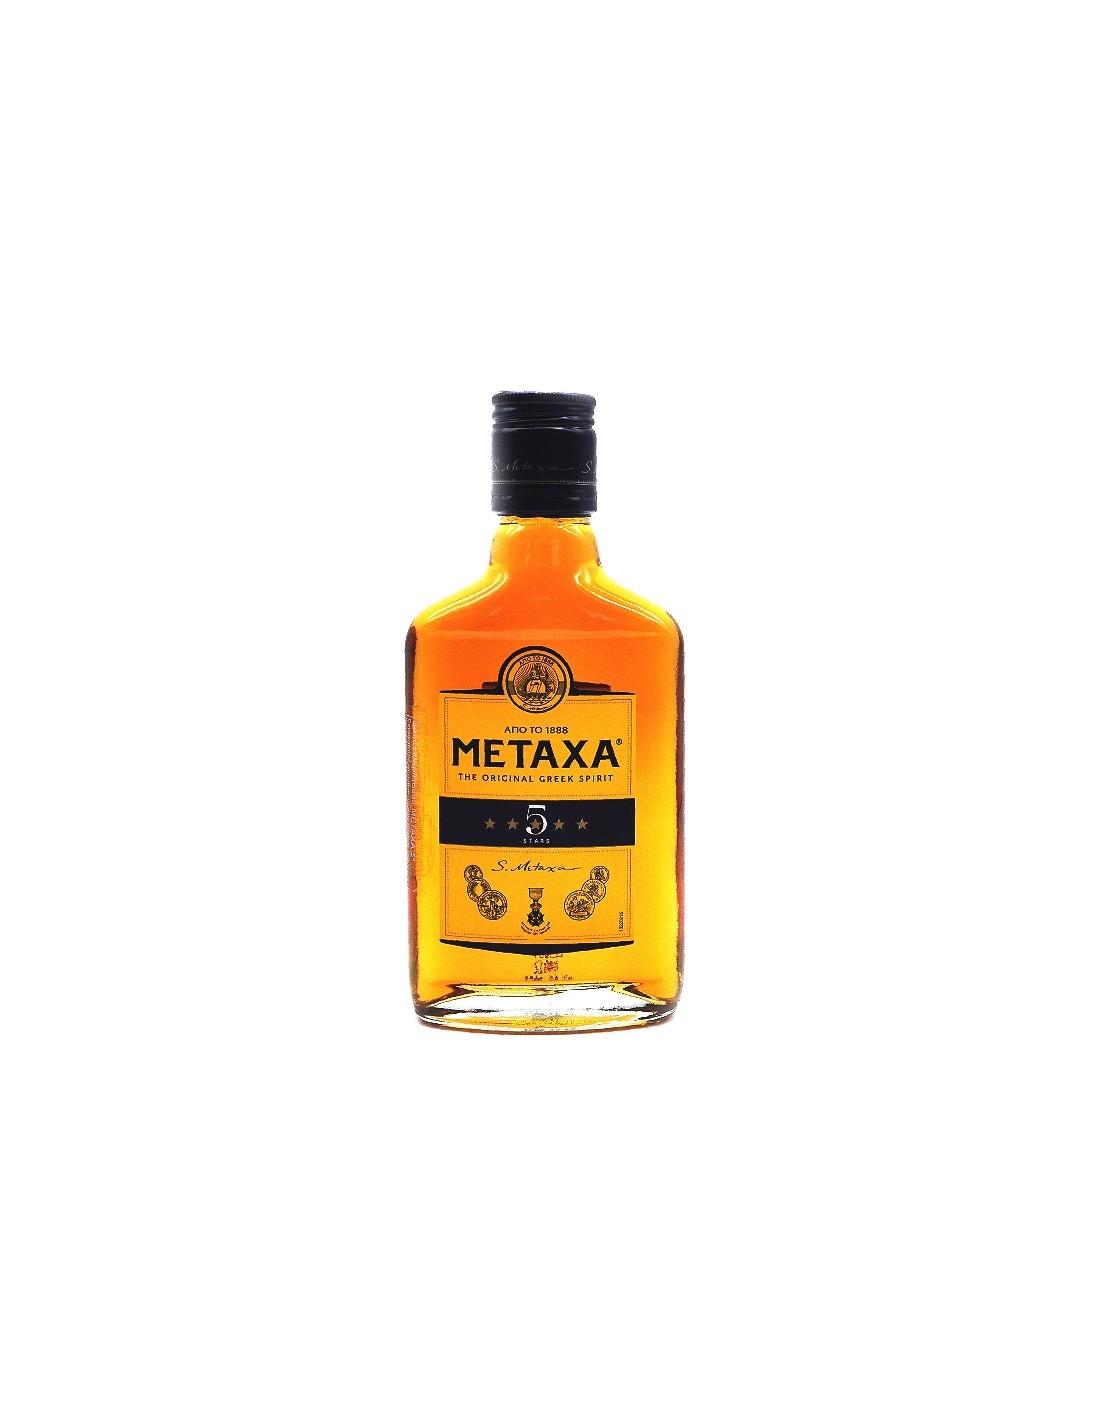 Brandy Metaxa 5*, 38% alc., 0.02L, Grecia